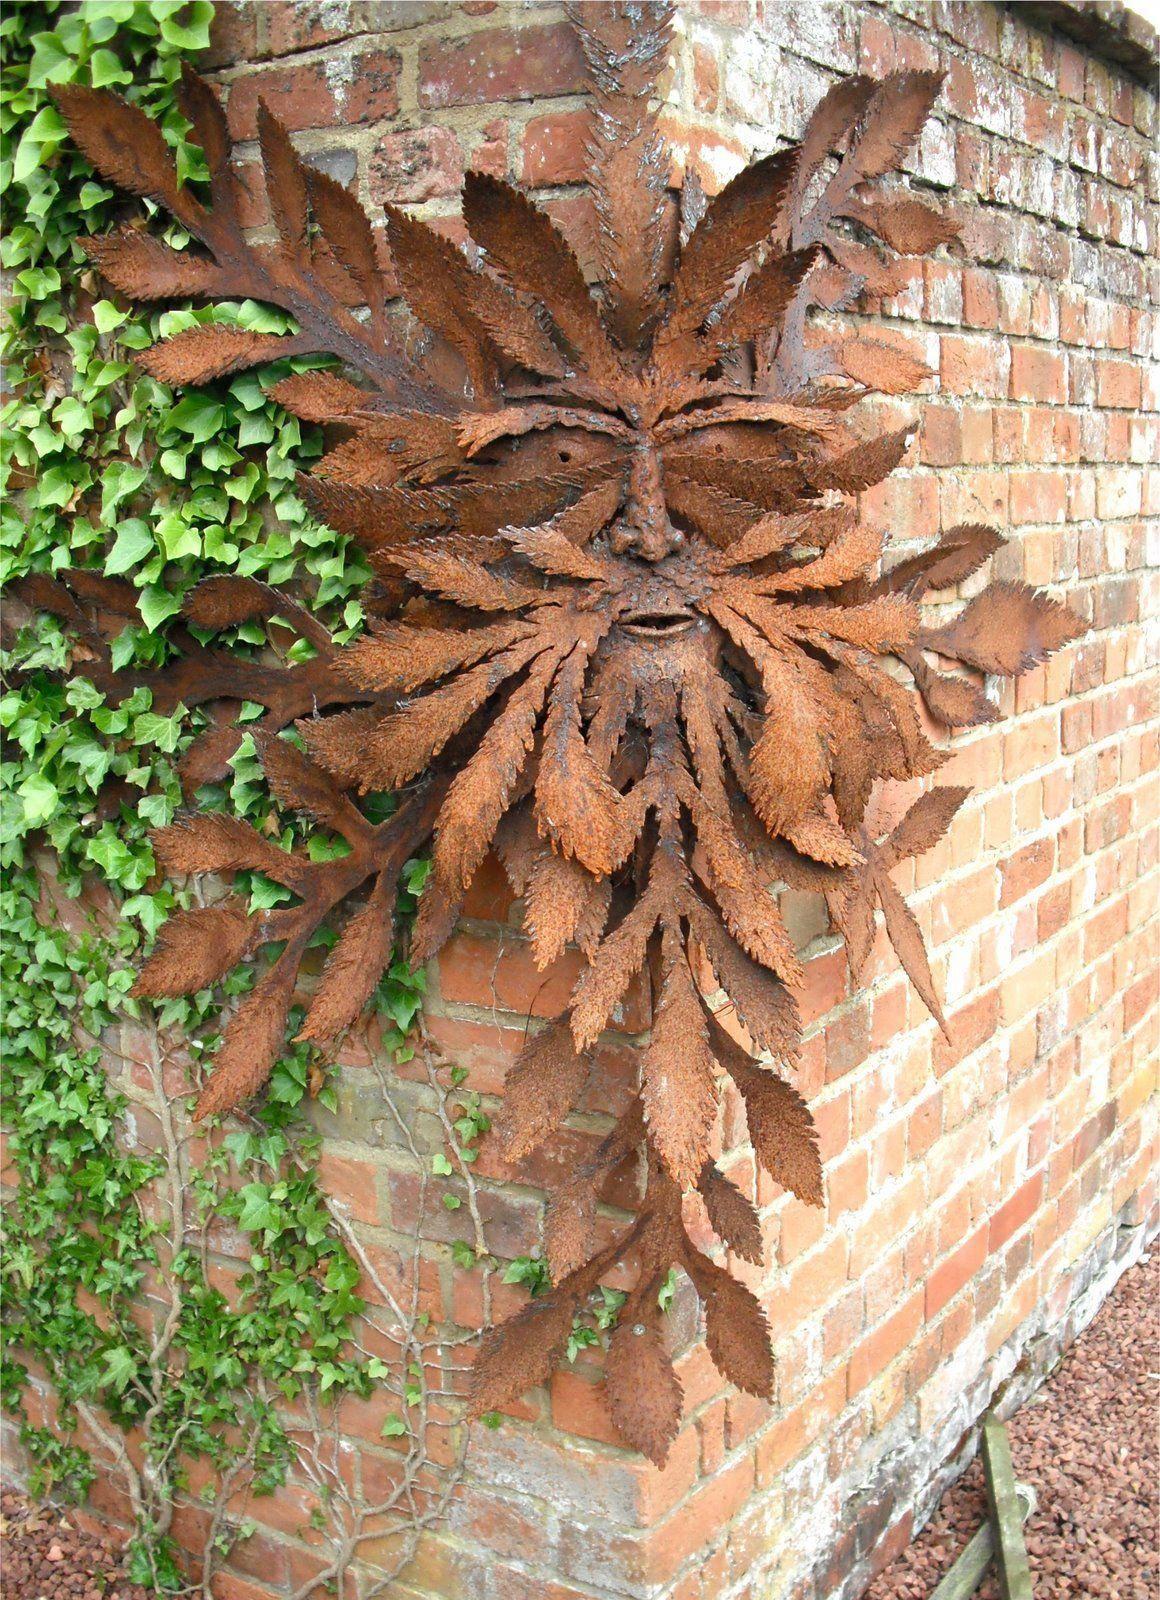 Green Man Metal Sculpture Artist Gordon Dickenson From Stitchingwithschnauzerandsiamese Blog Metal Sculpture Artists Metal Garden Art Metal Tree Wall Art